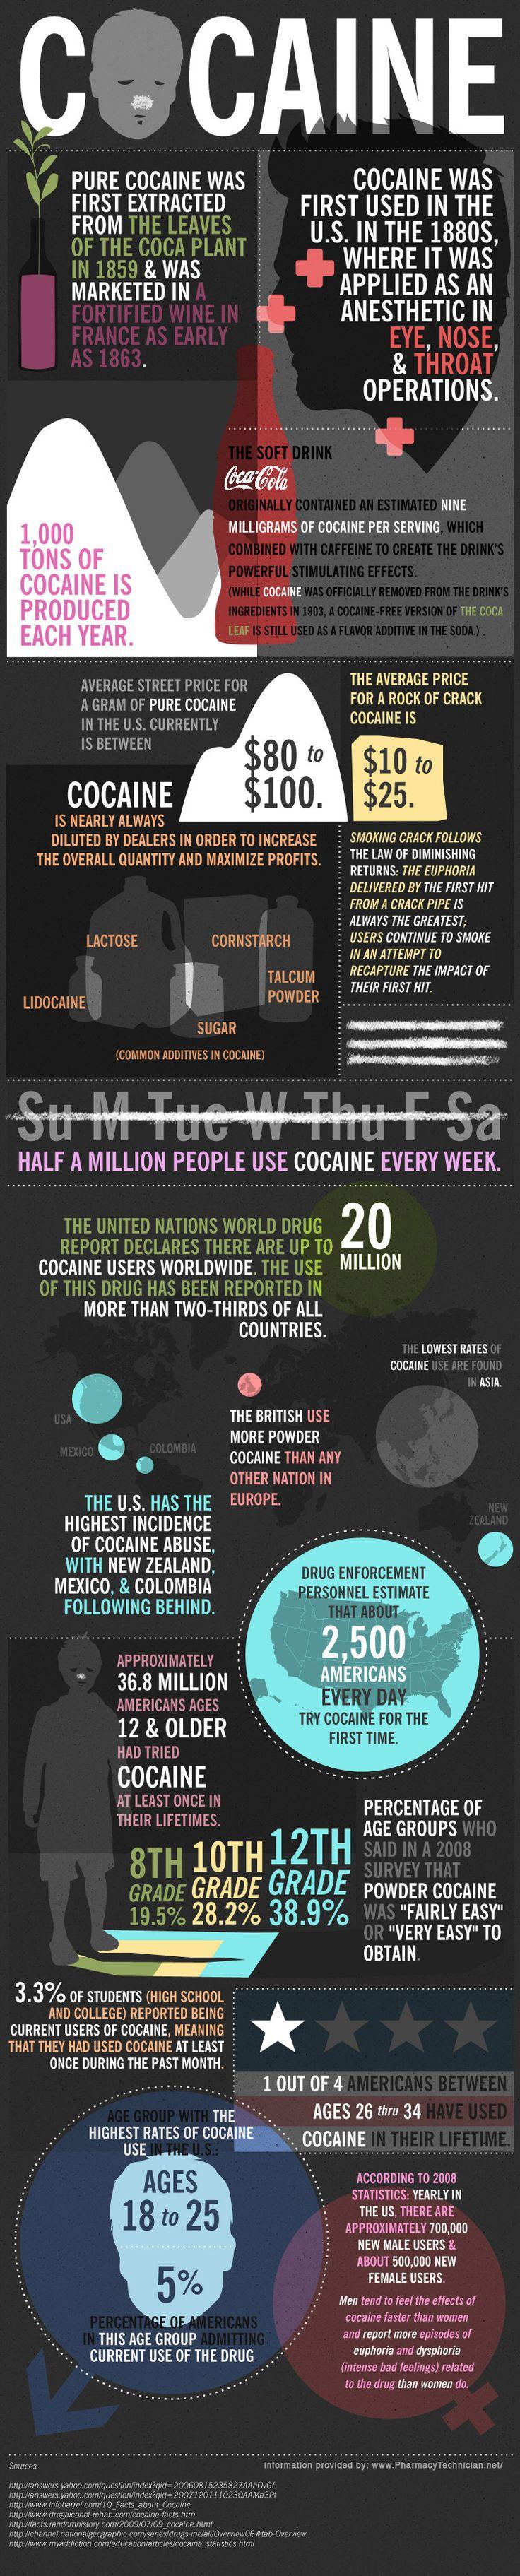 #cocaine #addiction   http://www.addictions.com/cocaine/